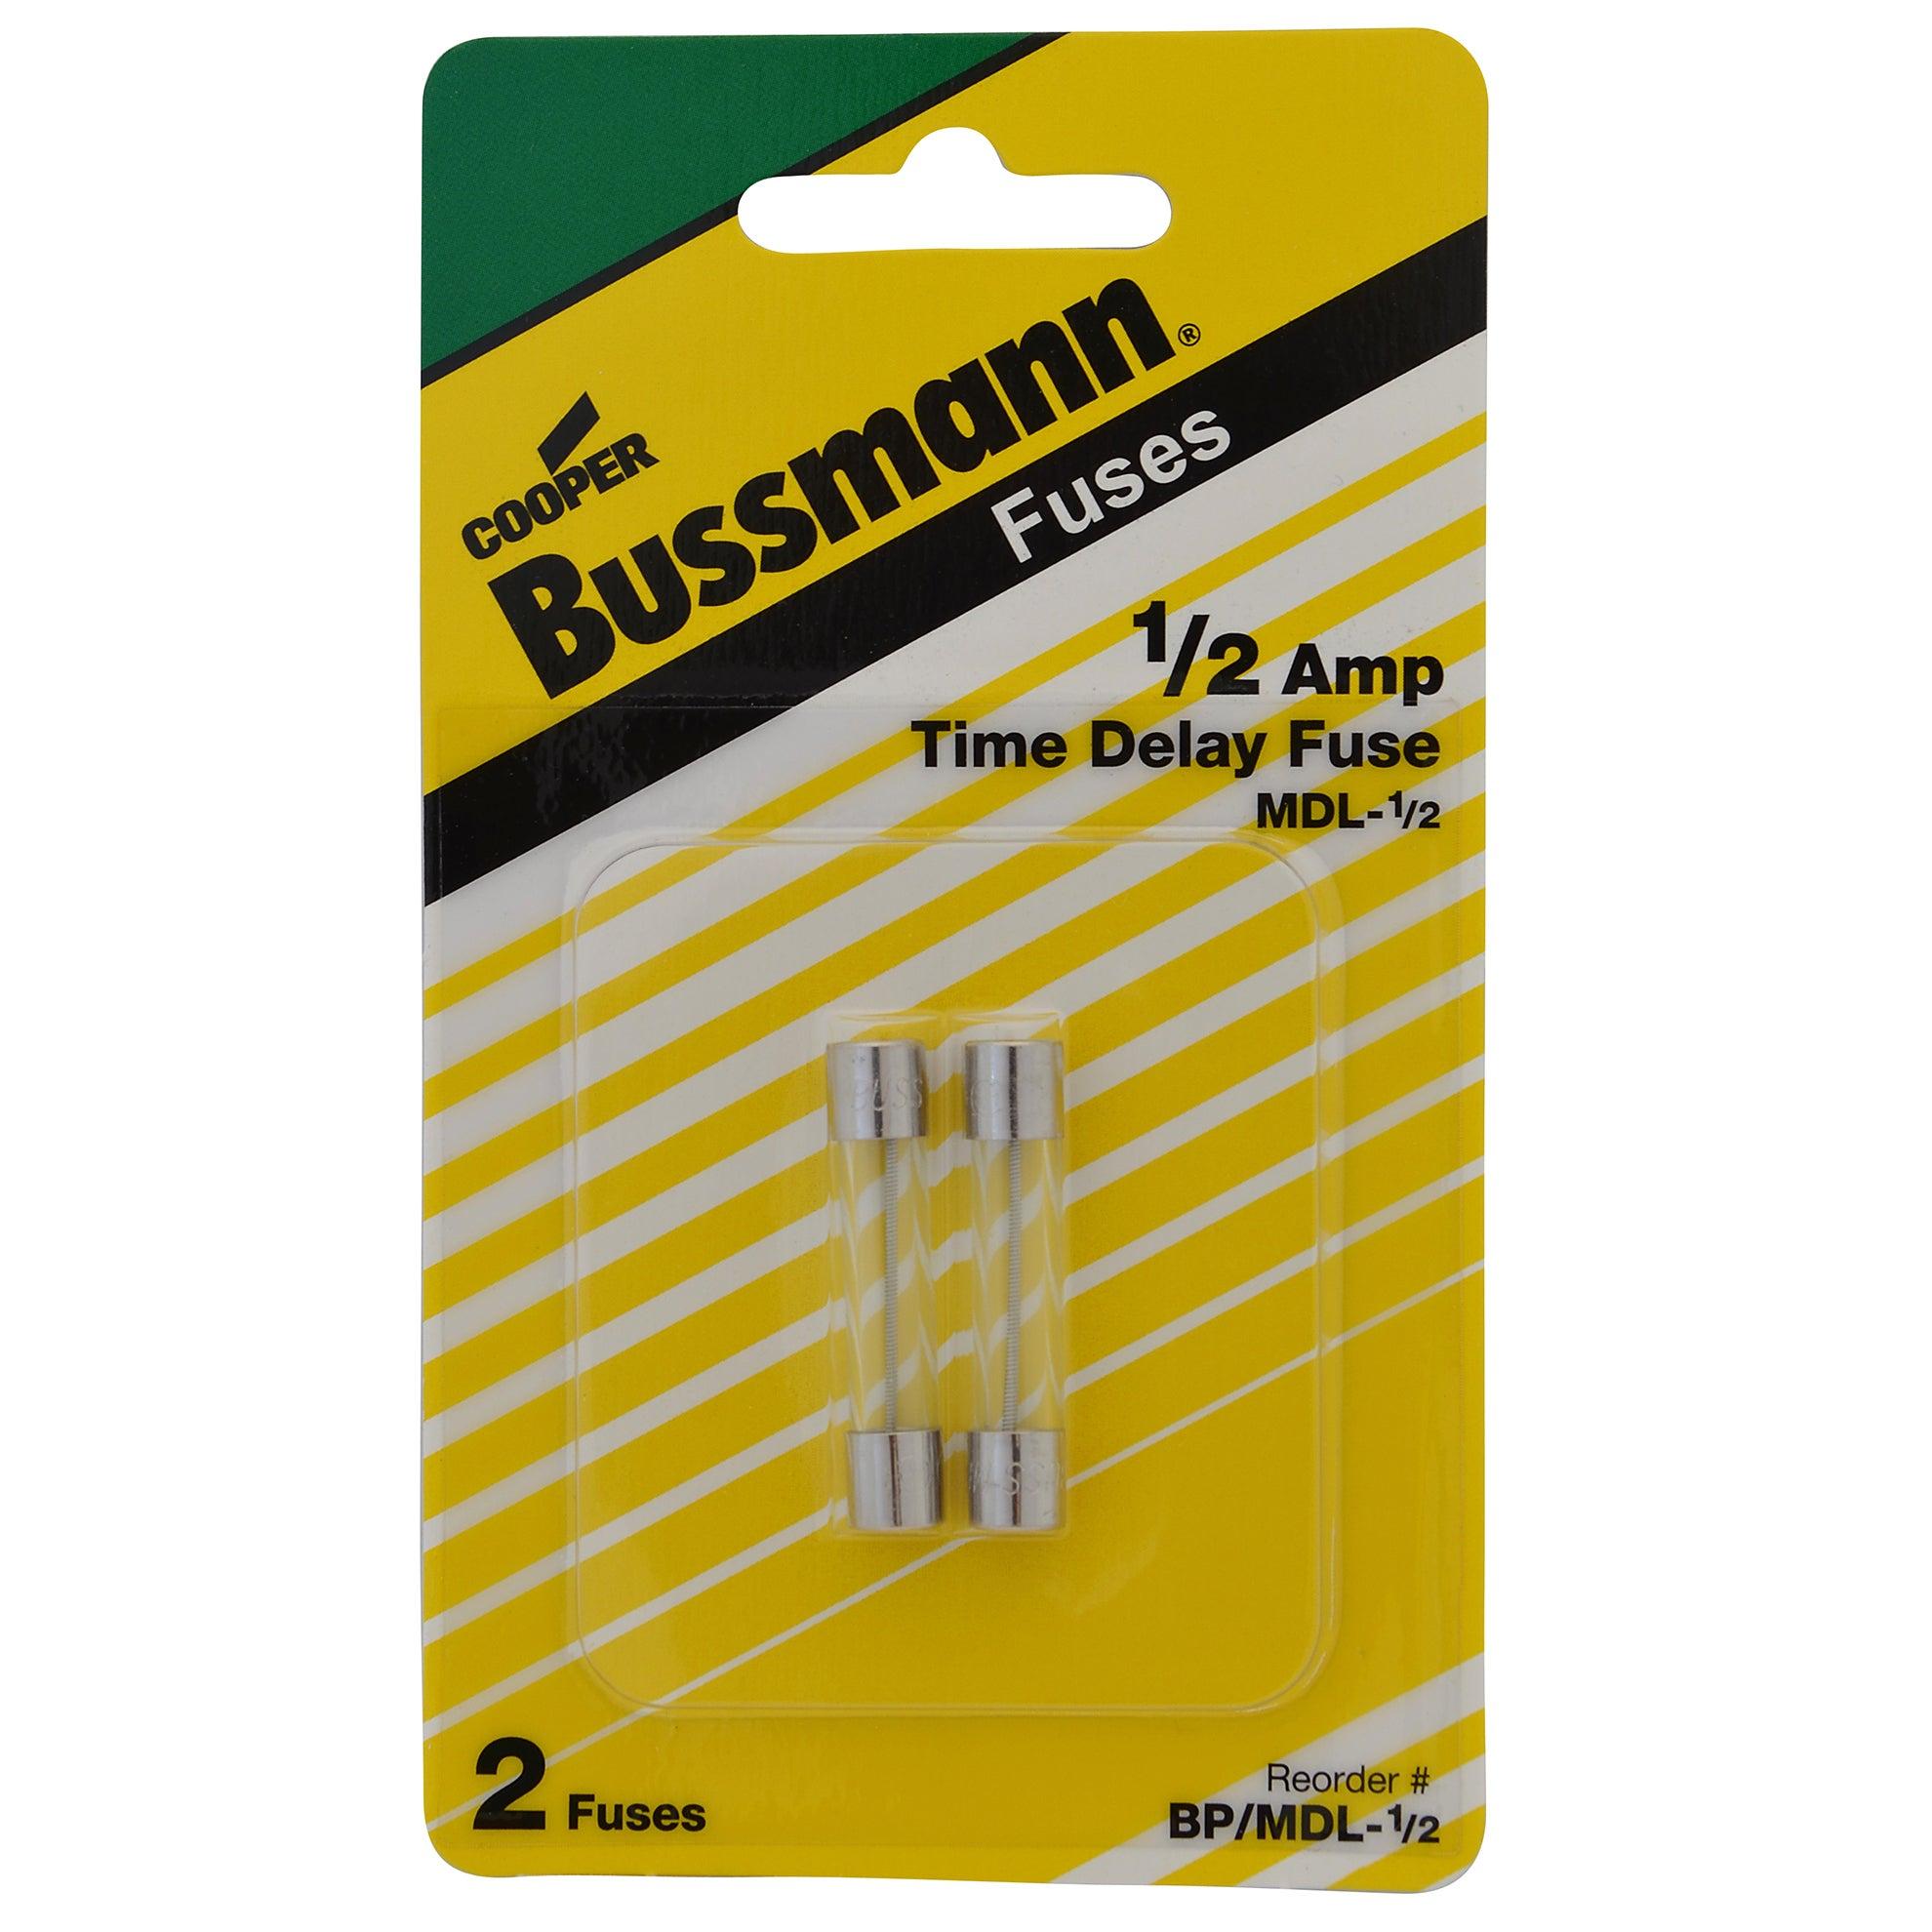 Bussmann BP/MDL-1/2 1/2 Amp Glass Tube Time Delay Fuse 2-...